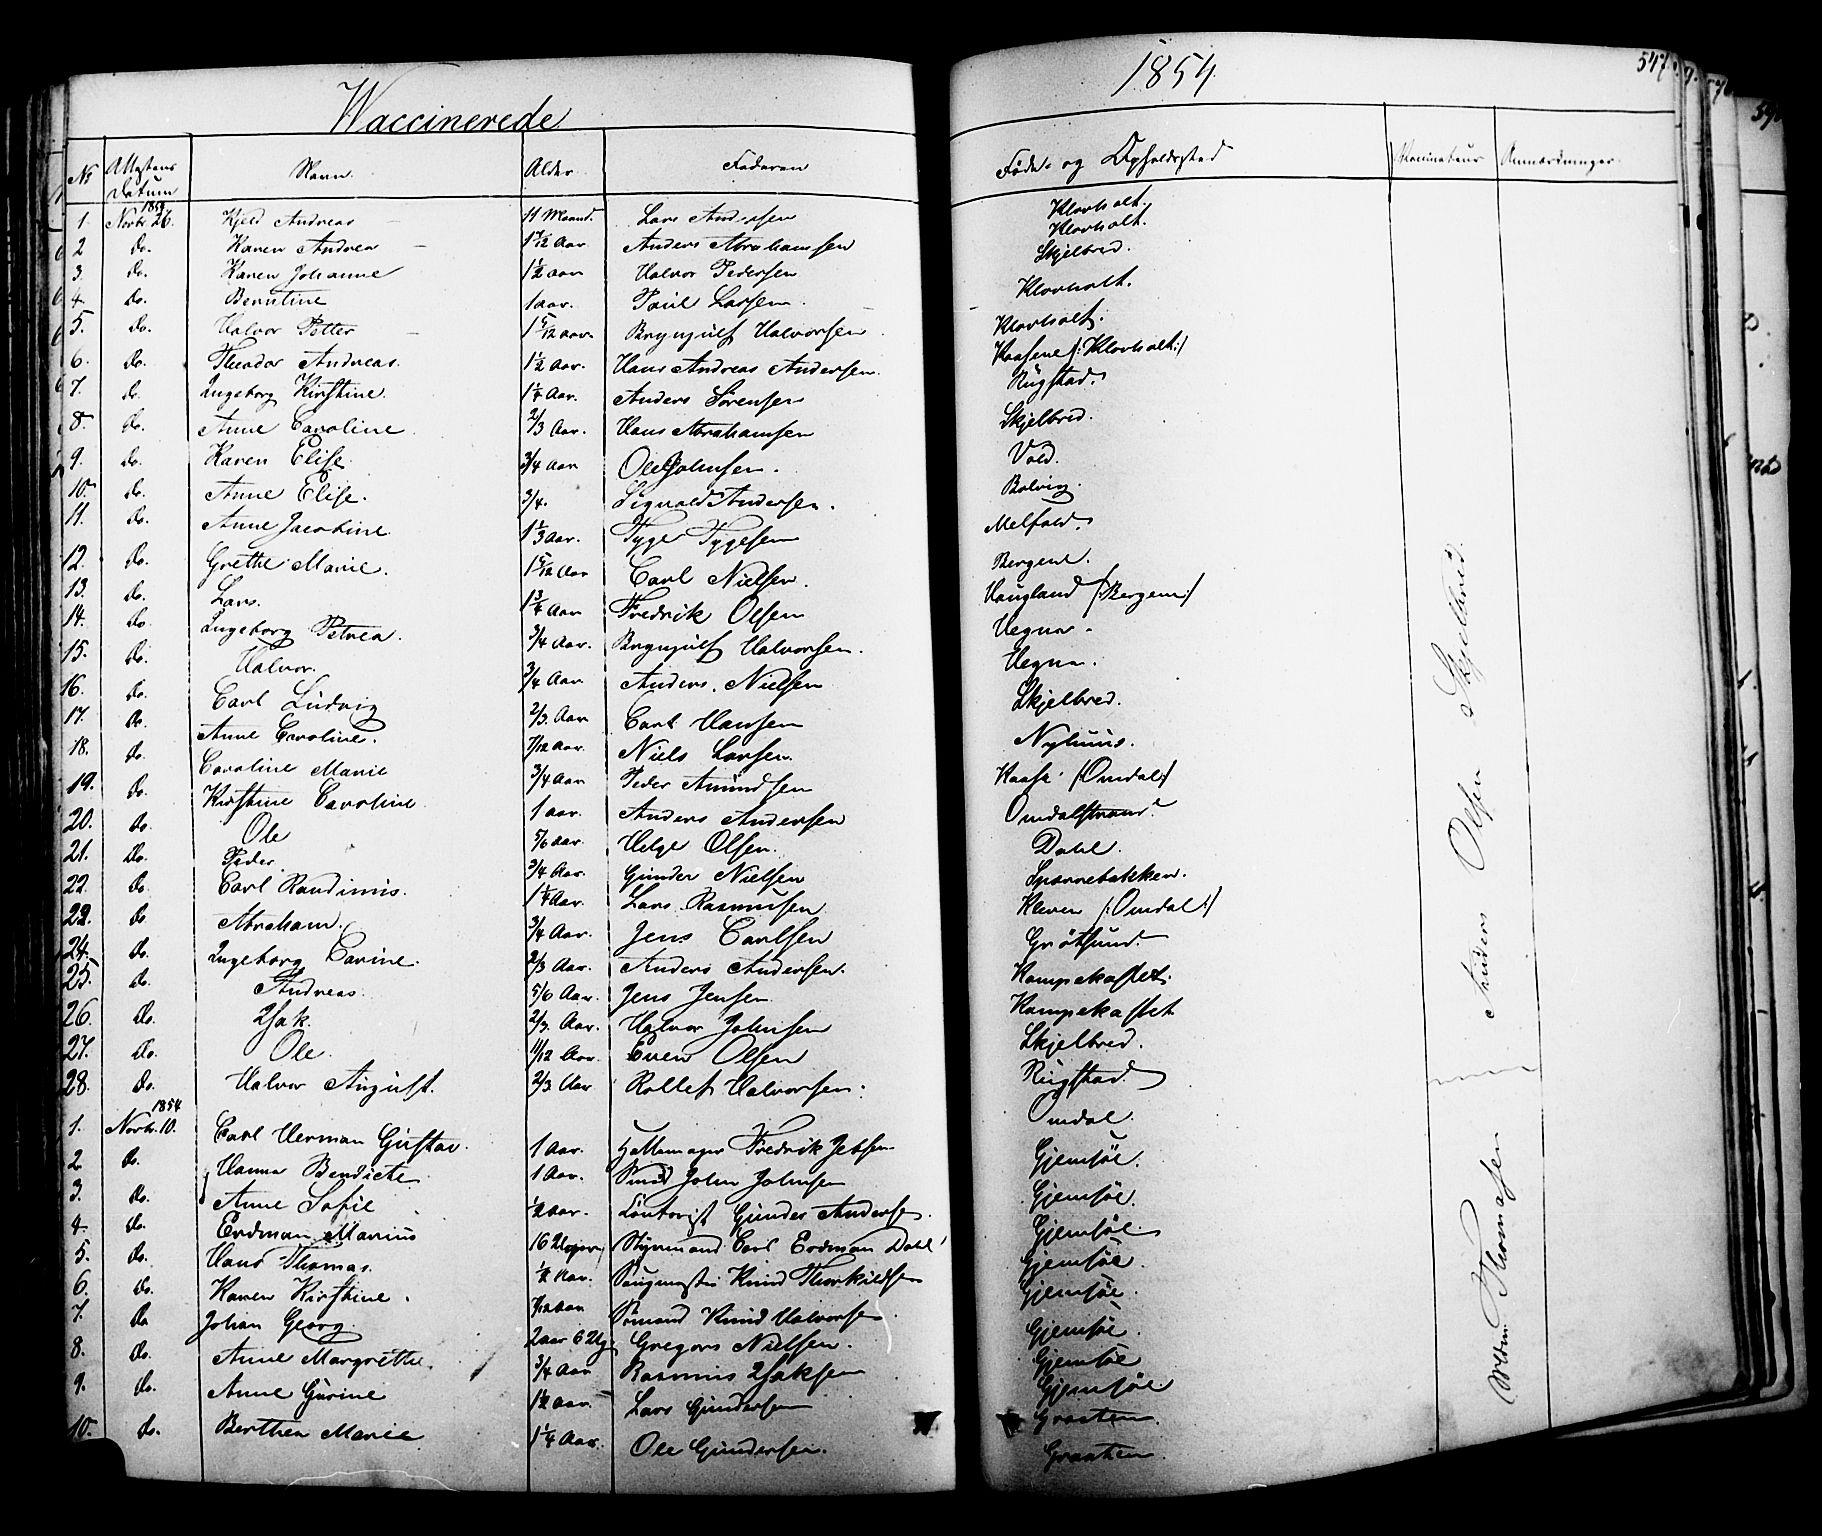 SAKO, Solum kirkebøker, F/Fa/L0006: Ministerialbok nr. I 6, 1844-1855, s. 547